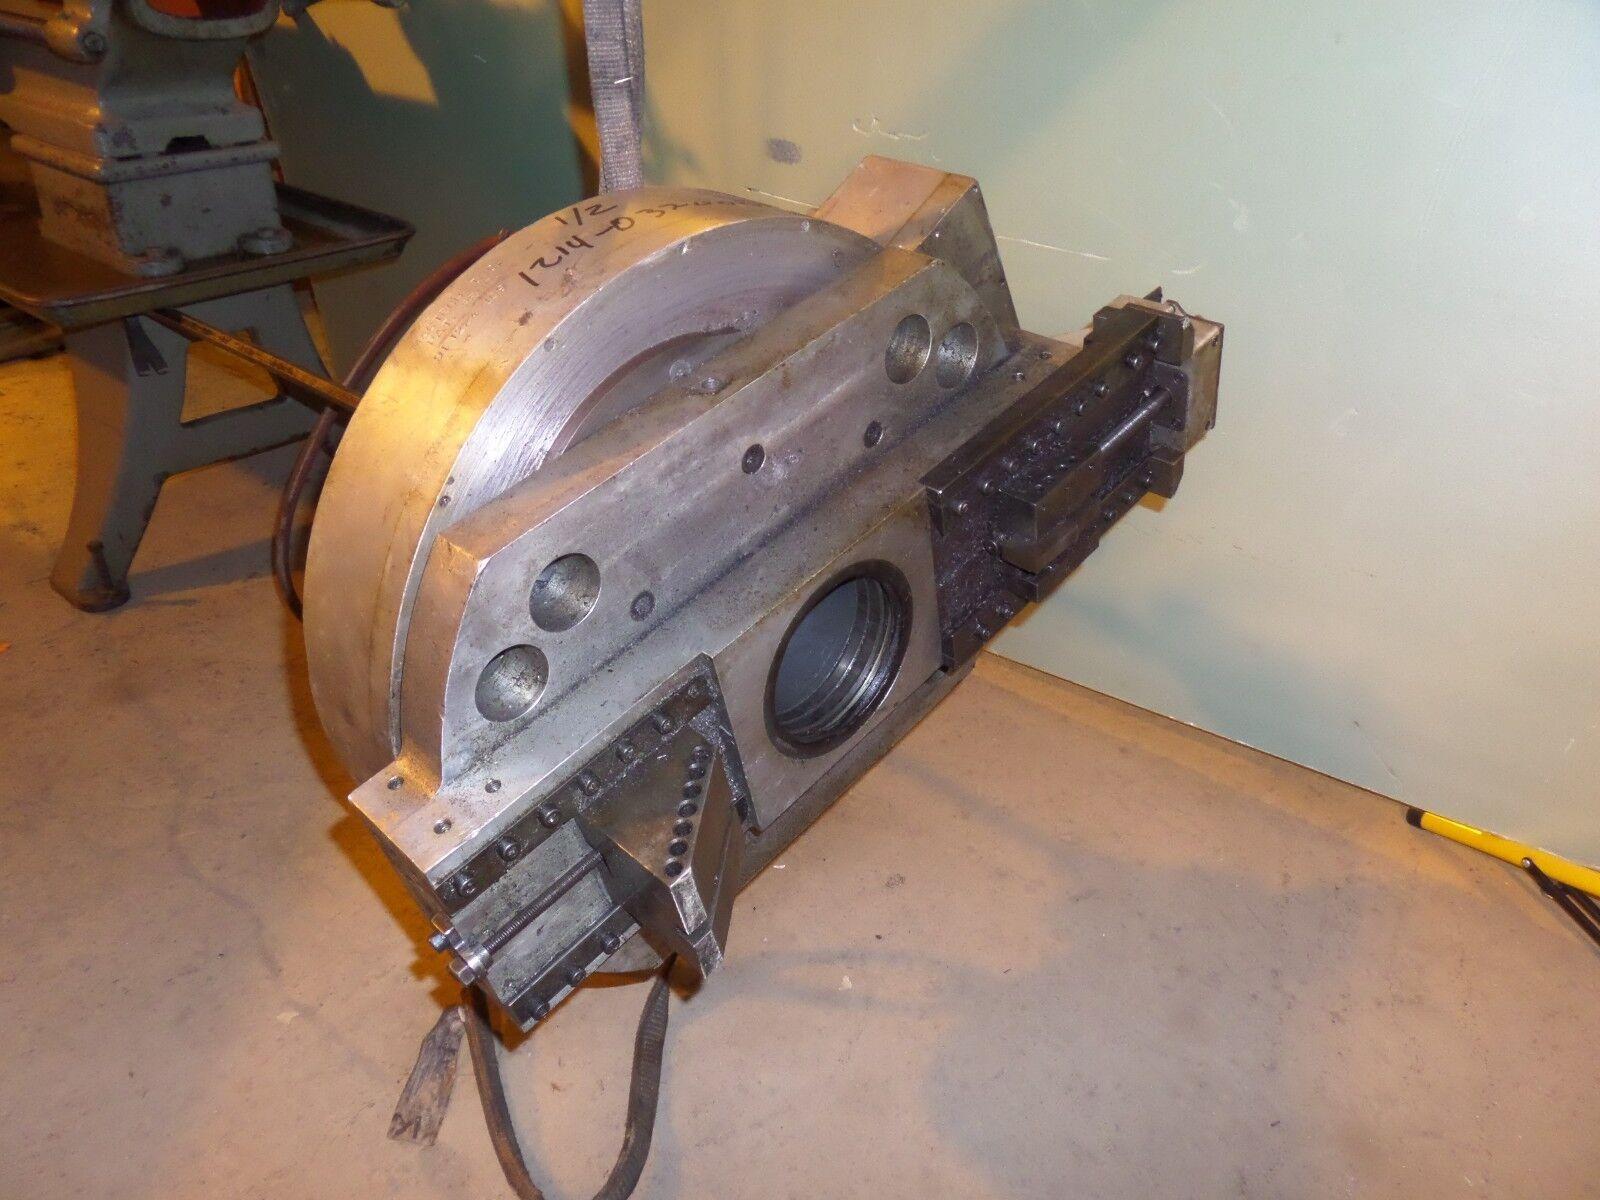 Mactech 1224 End Prep Lathe Pipe Beveler High Speed Beveling Machine